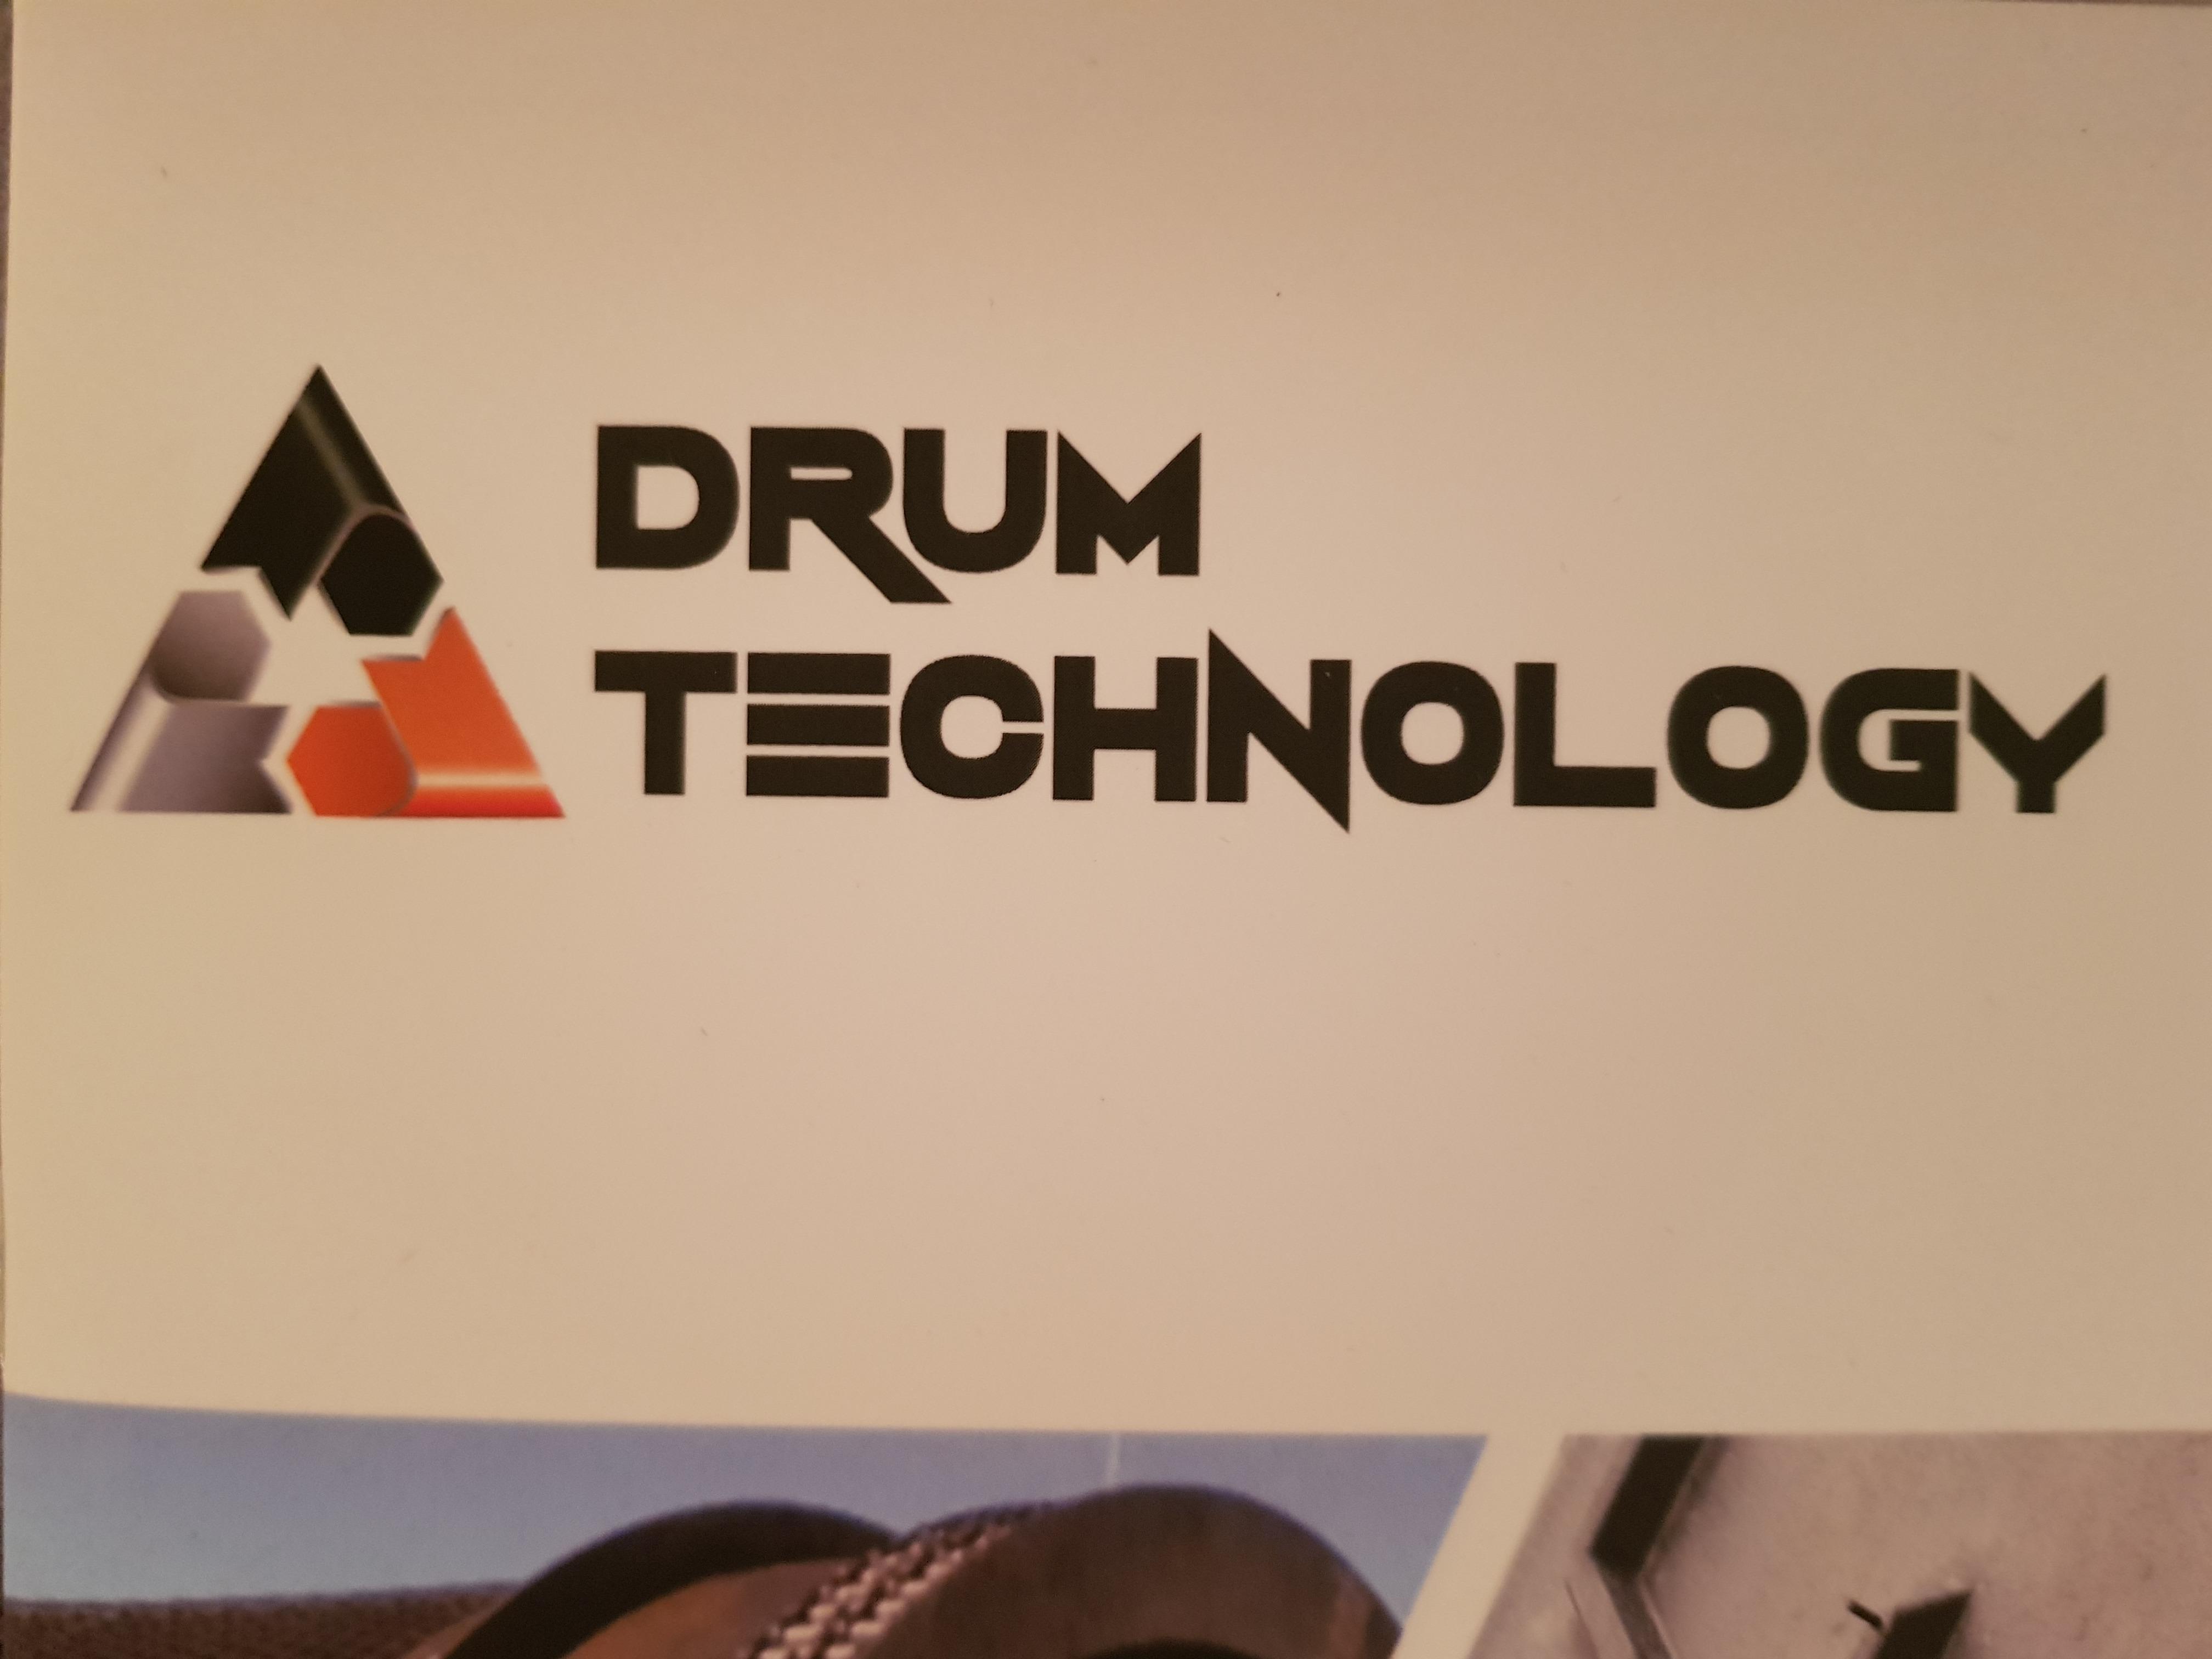 Drum Technology